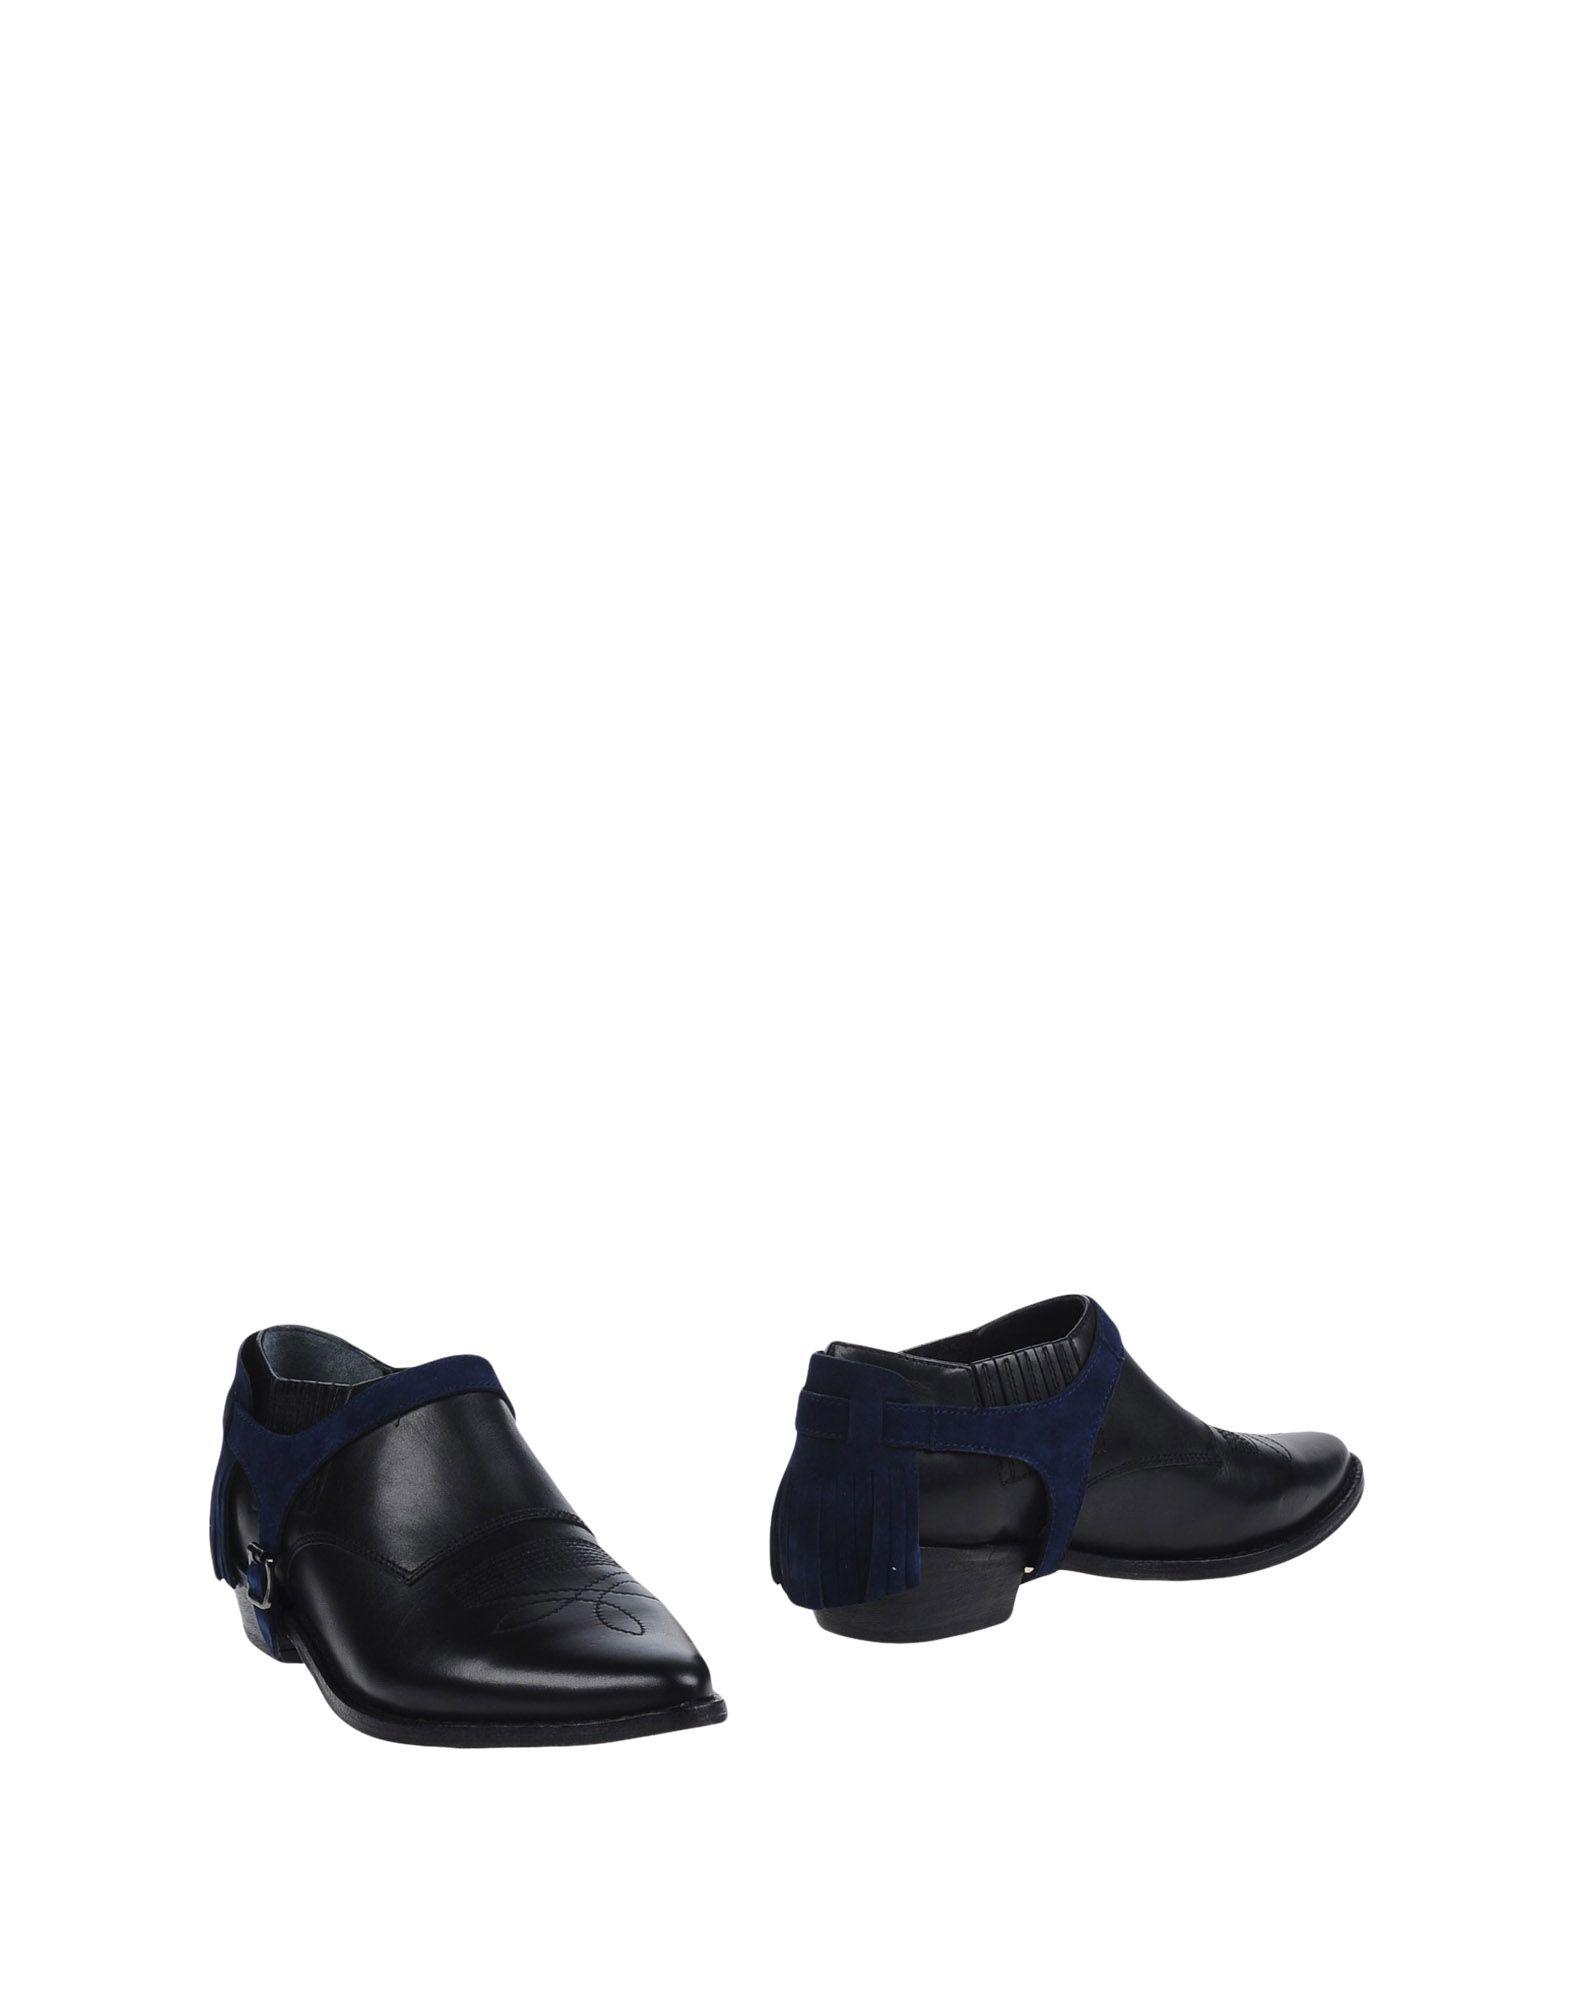 MR. WOLF Ботинки цены онлайн